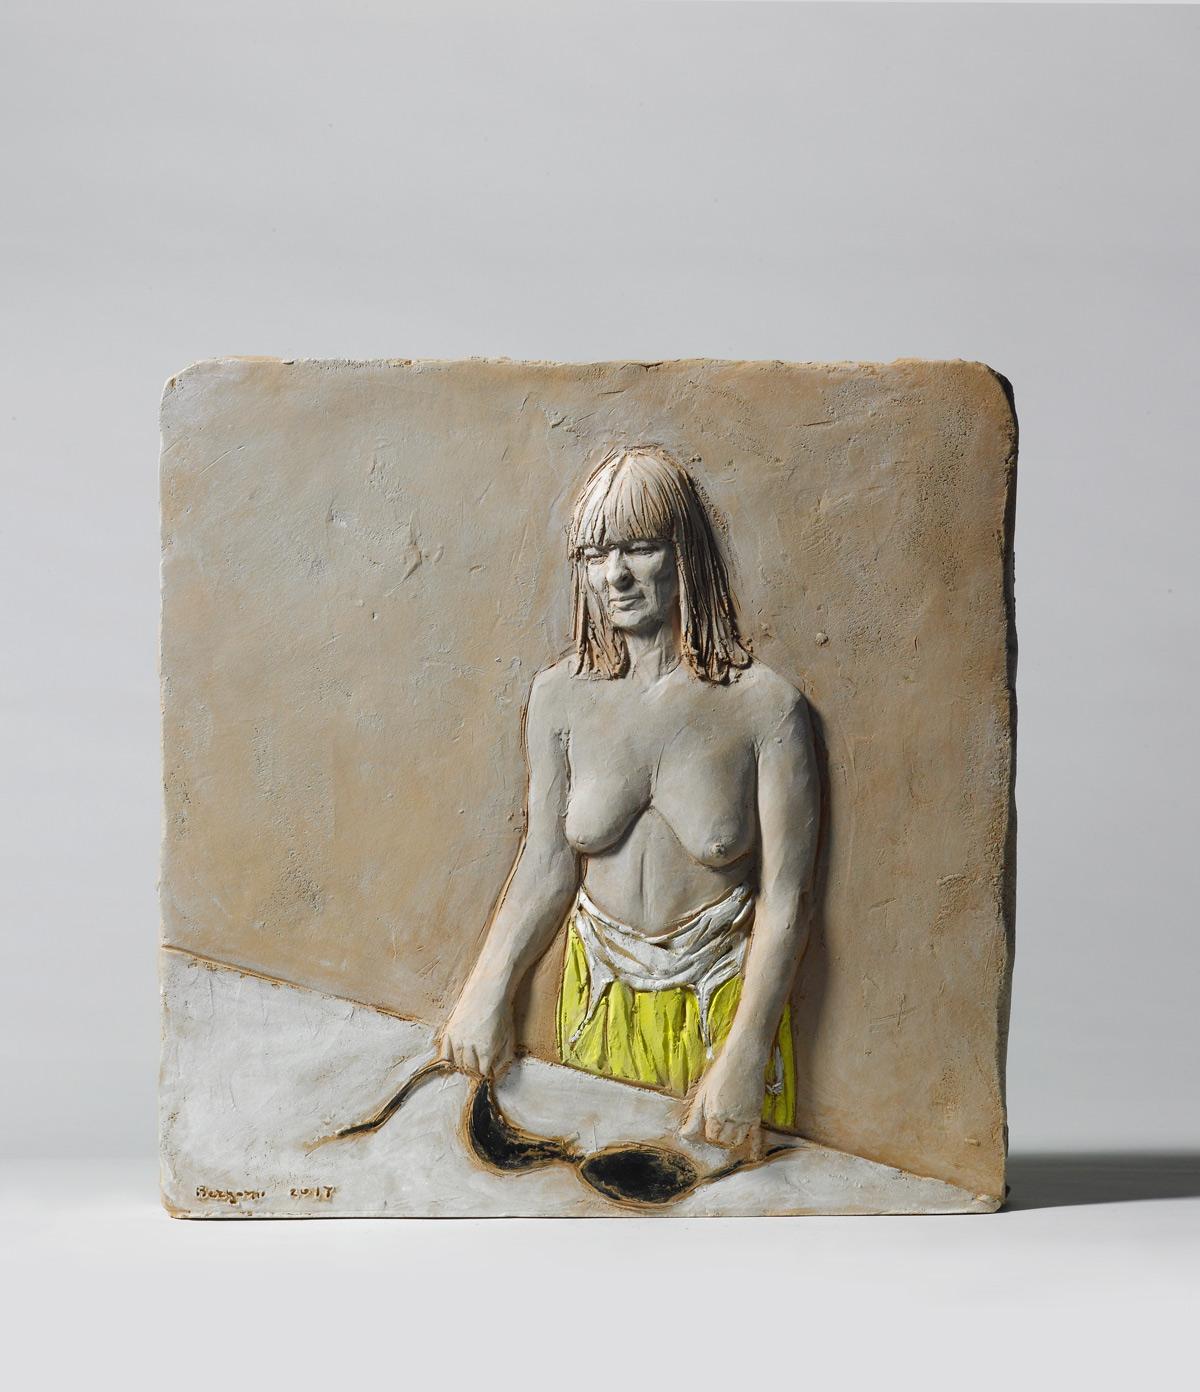 Giuseppe-Bergomi-9-etra-studio-tommasi